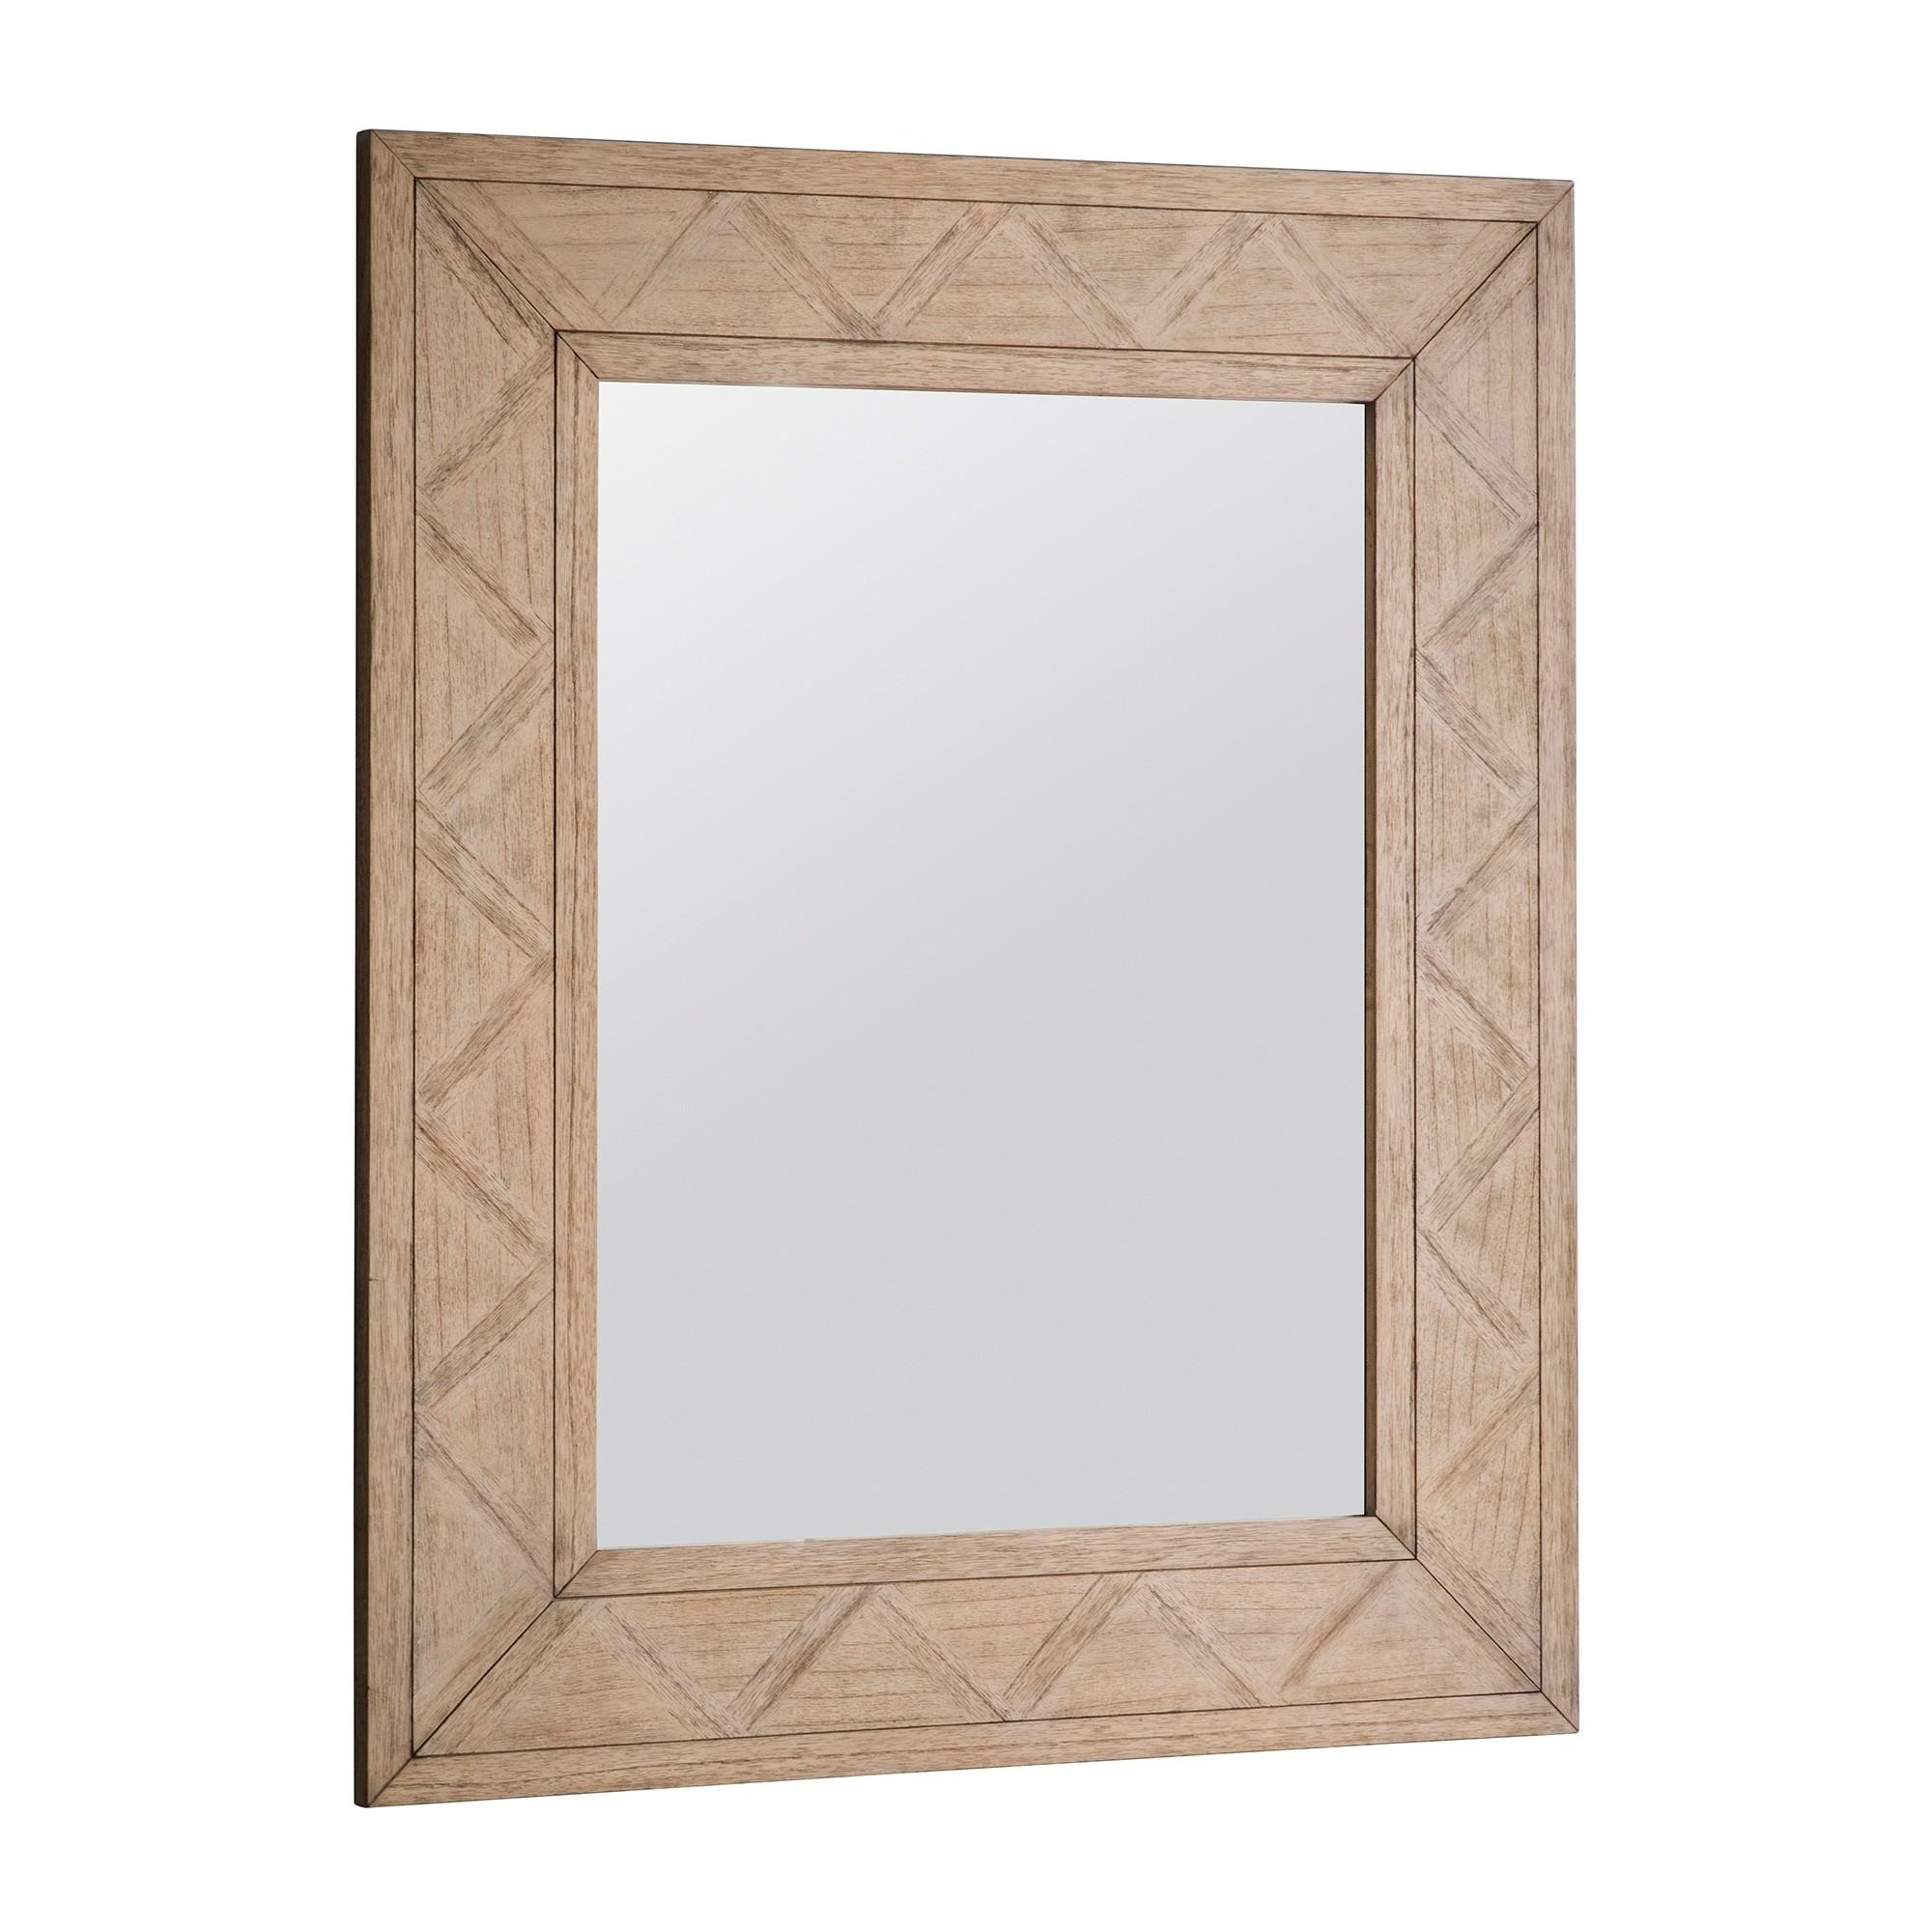 Mirren Mindi Wood Frame Wall Mirror, 110cm